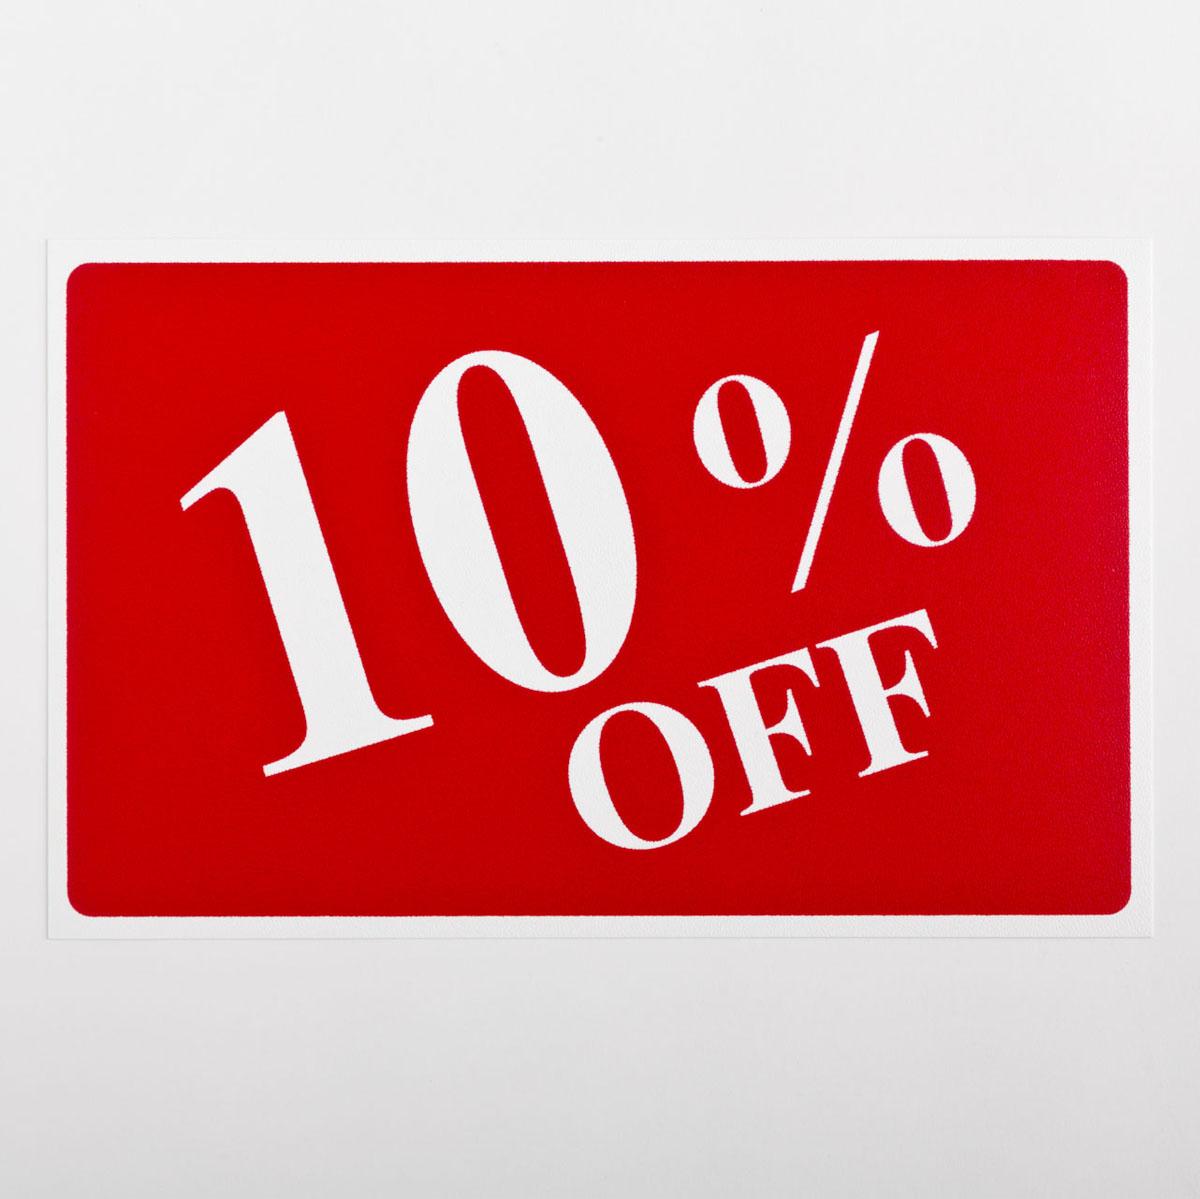 Http Www Abfixtures Com Store Fixtures 10 Off Sign